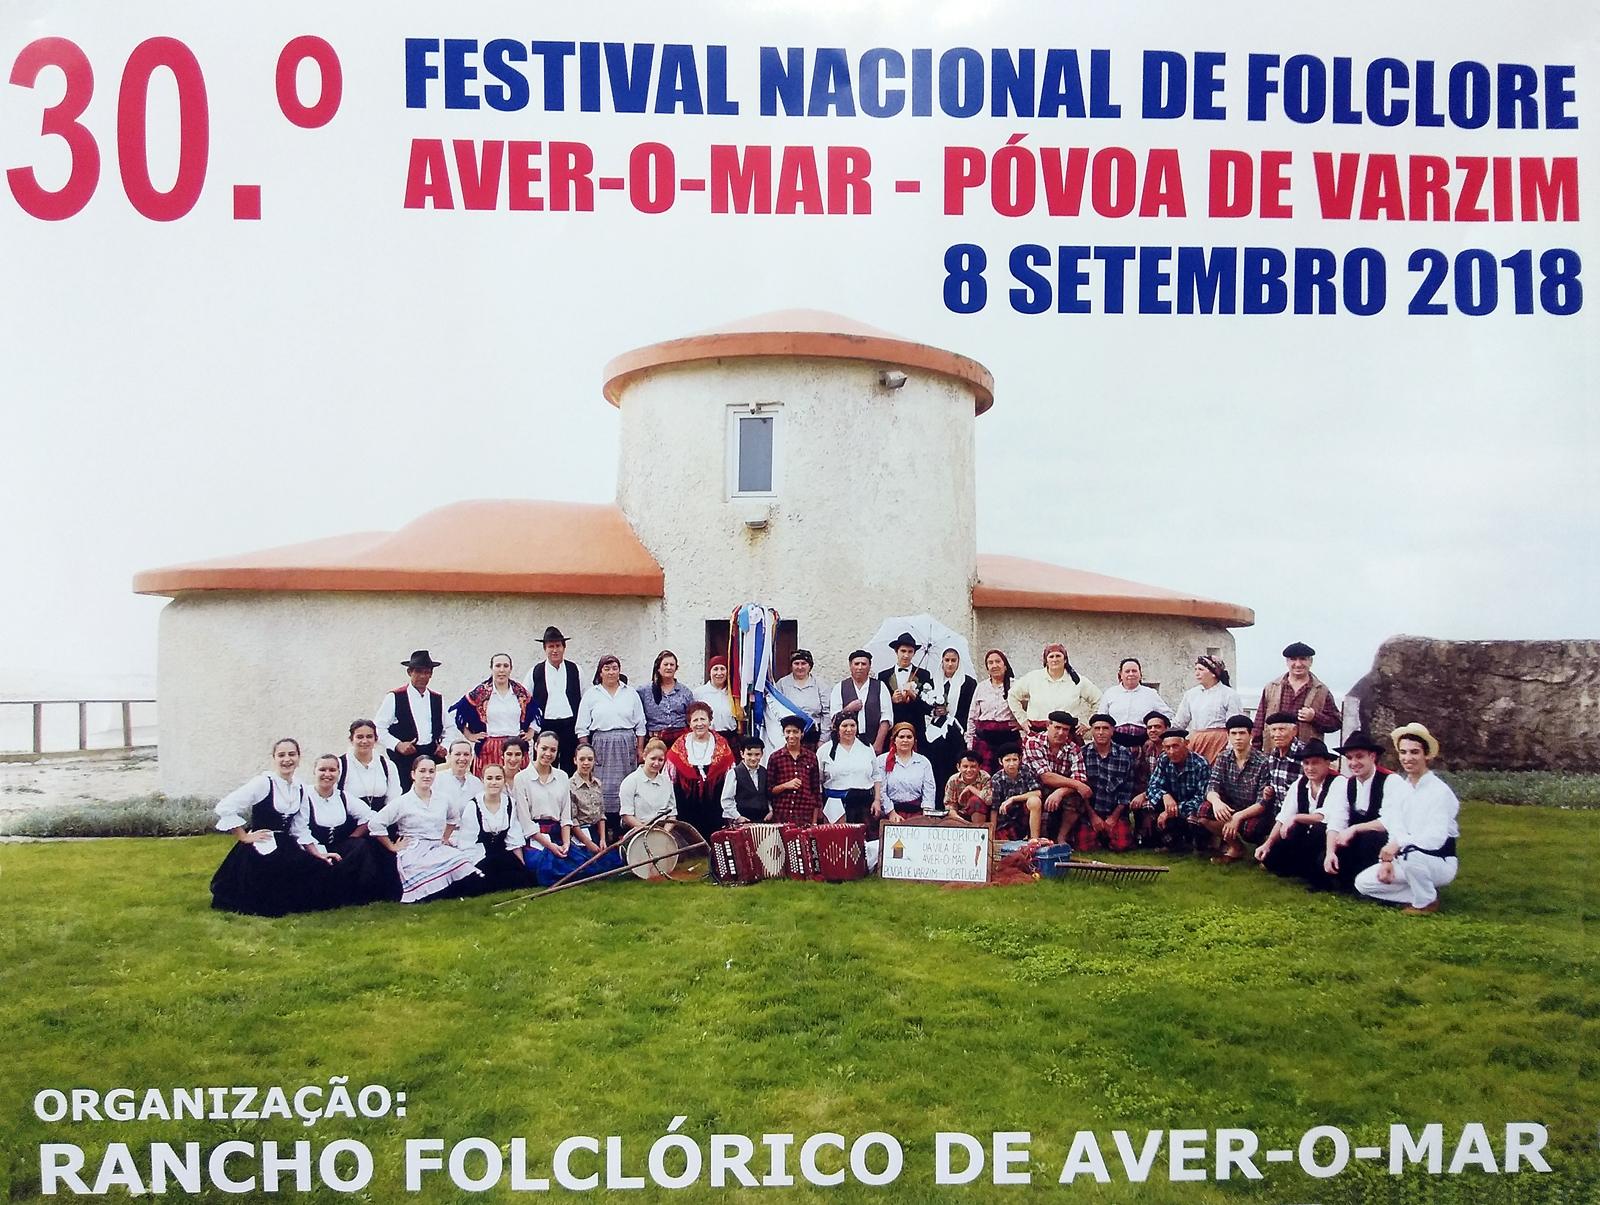 30º Festival Nacional de Folclore – 8 Setembro 2018